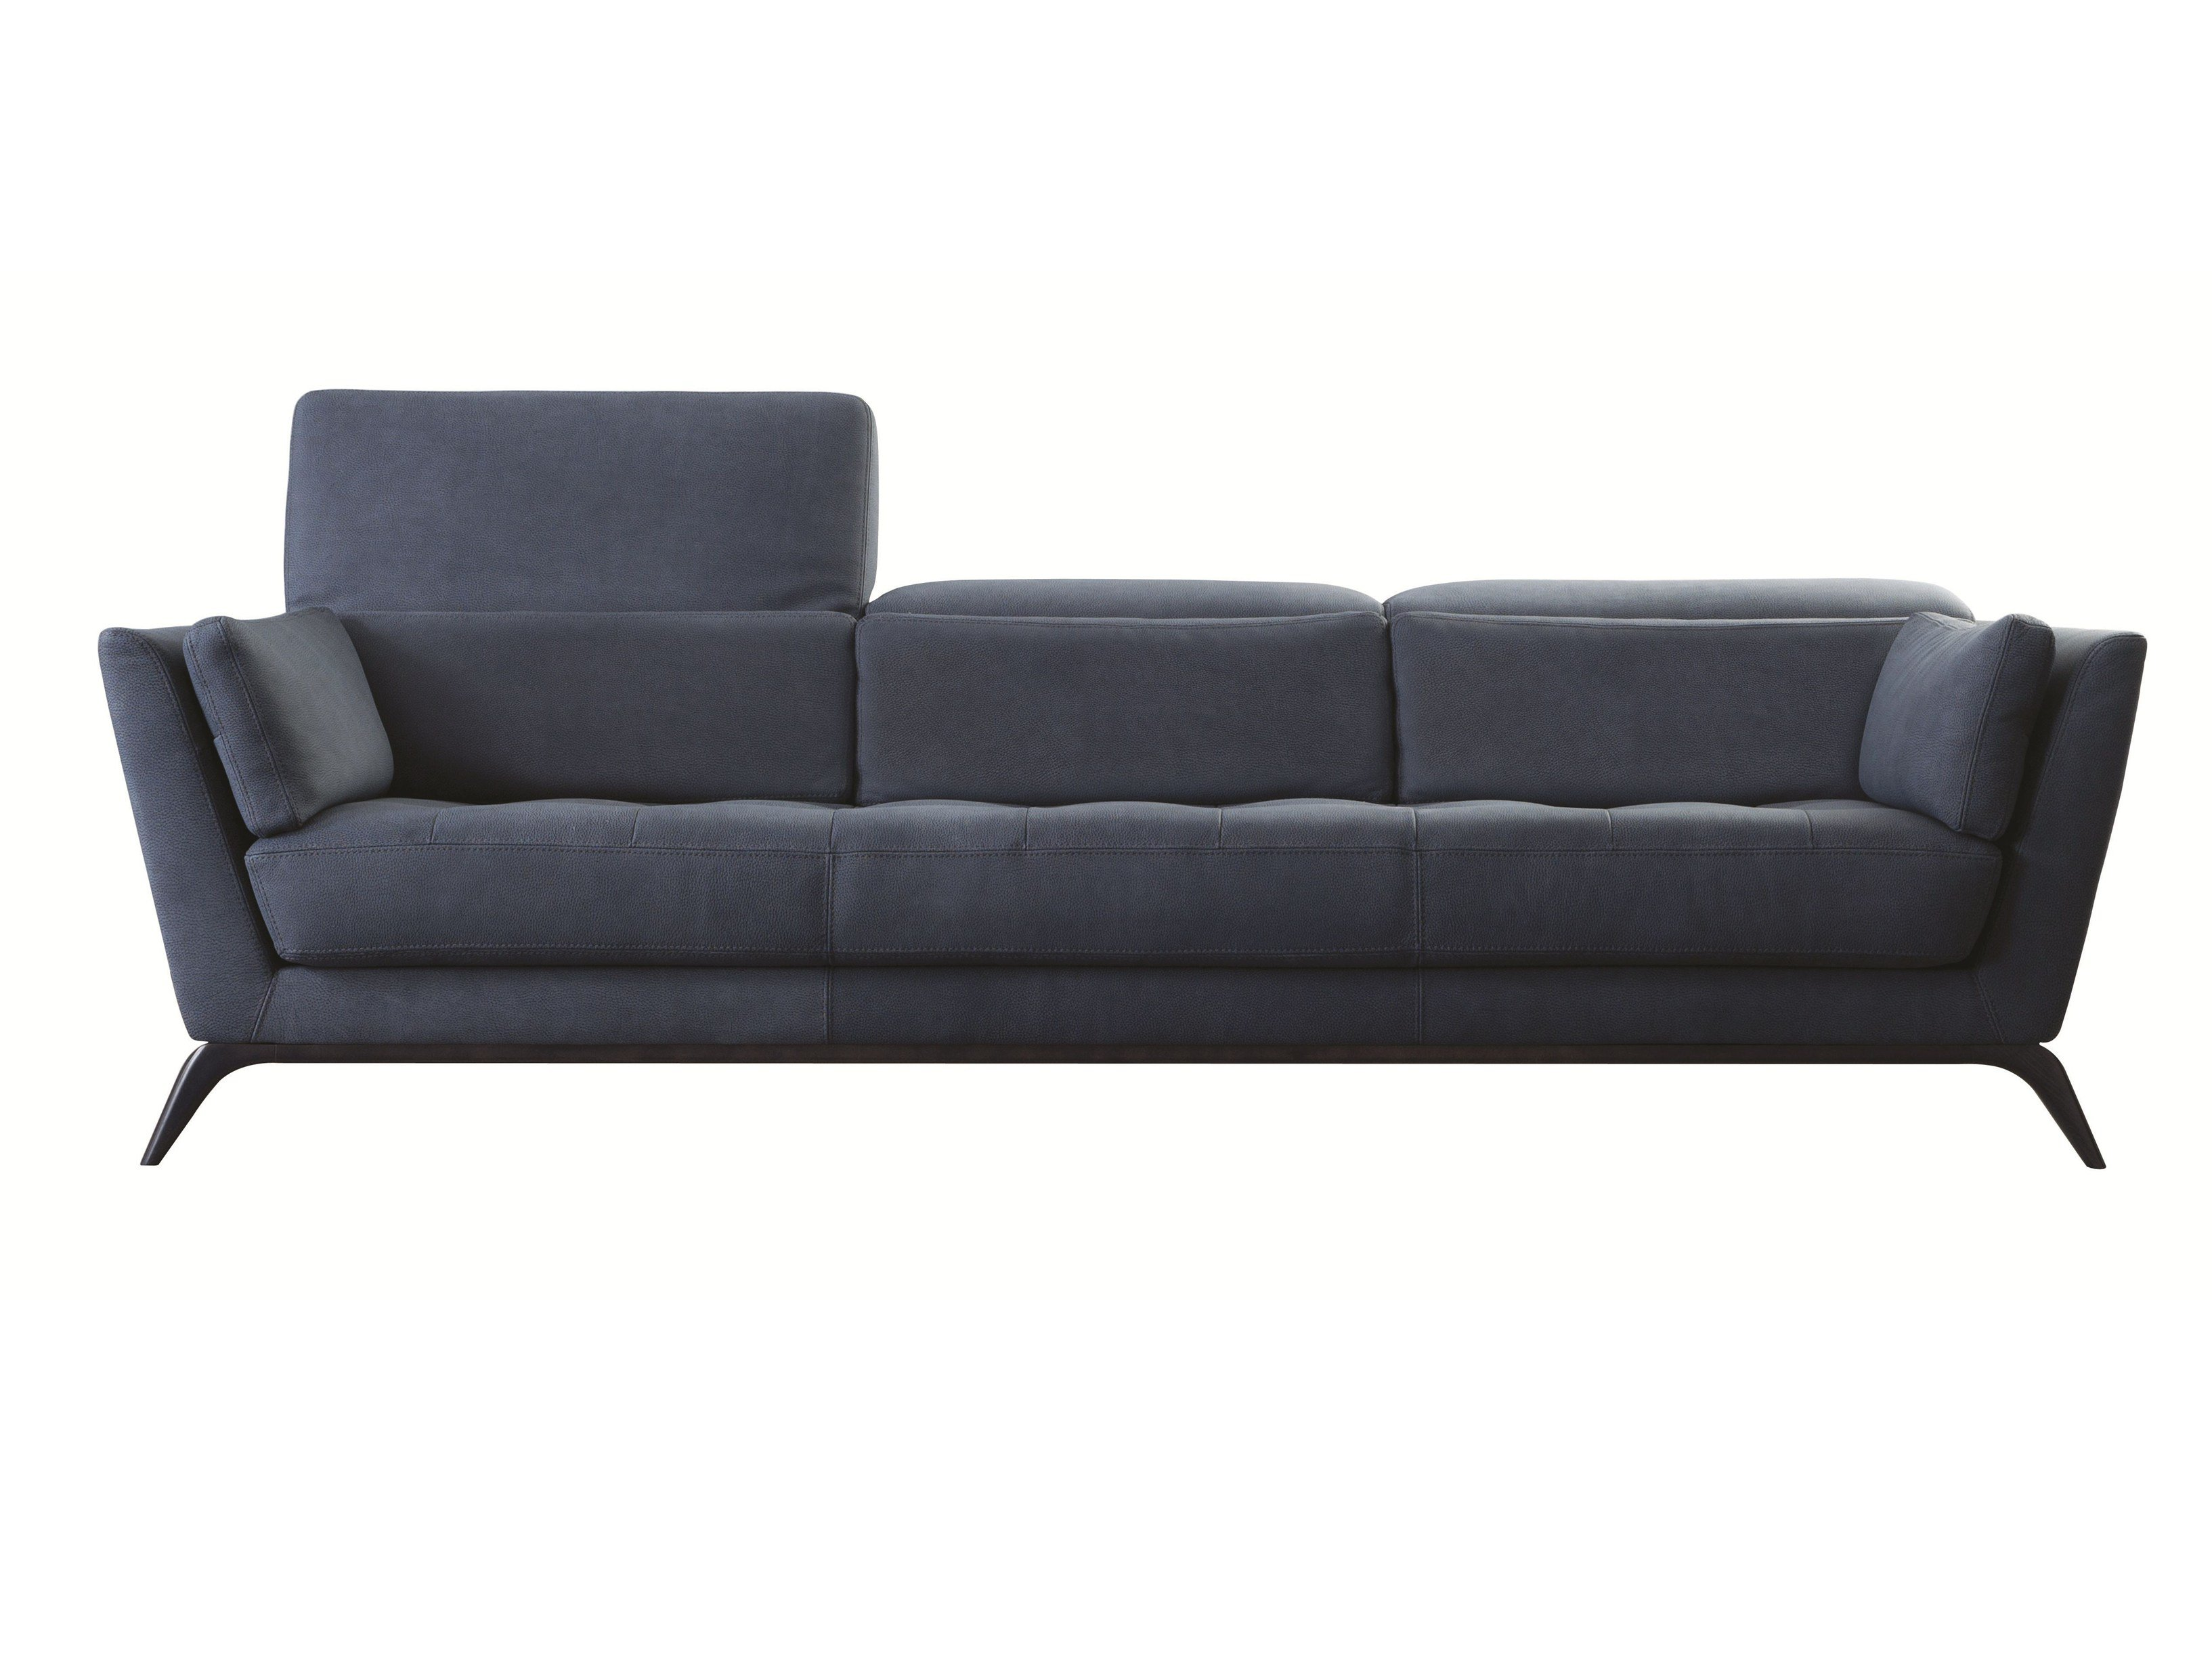 solde roche bobois cheap canap roche bobois occasion mooi solde canape cuir plan de maison with. Black Bedroom Furniture Sets. Home Design Ideas